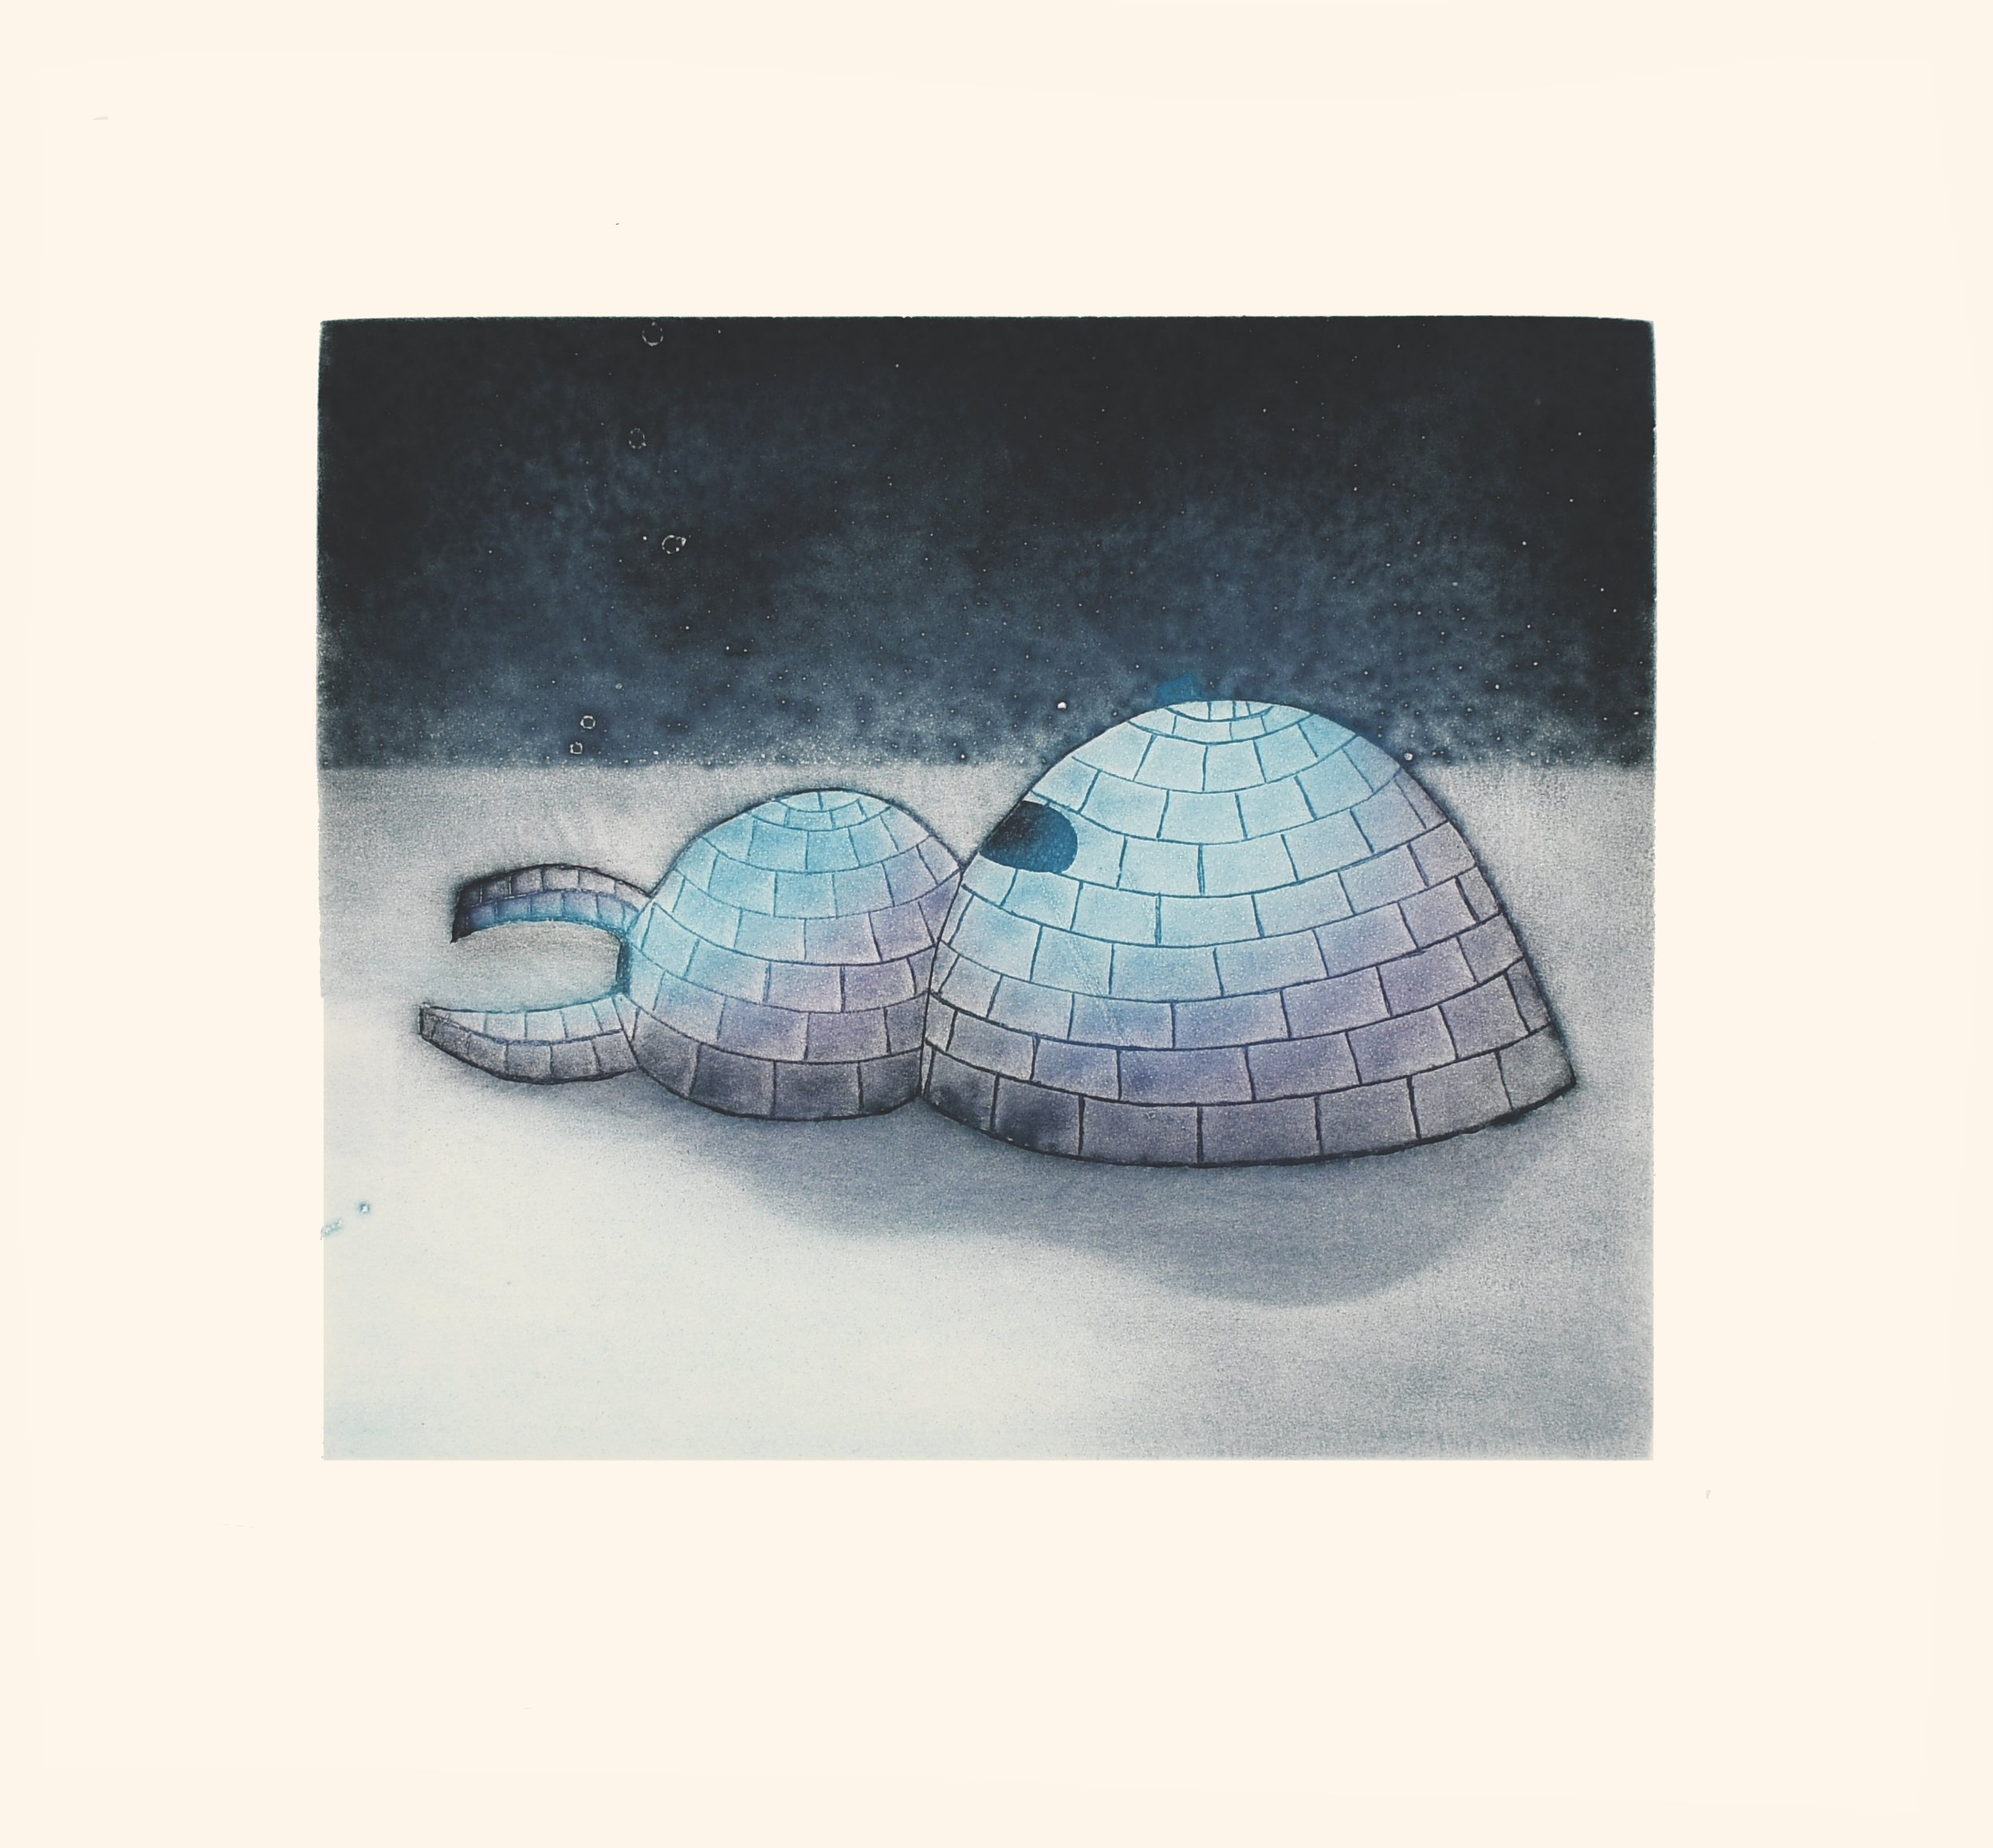 SITA SAILA  25. Igluvigaq (A Place You Live)  Etching & Aquatint  Paper: Arches White  Printer: Studio PM  44.7 x 48 cm  $ 600